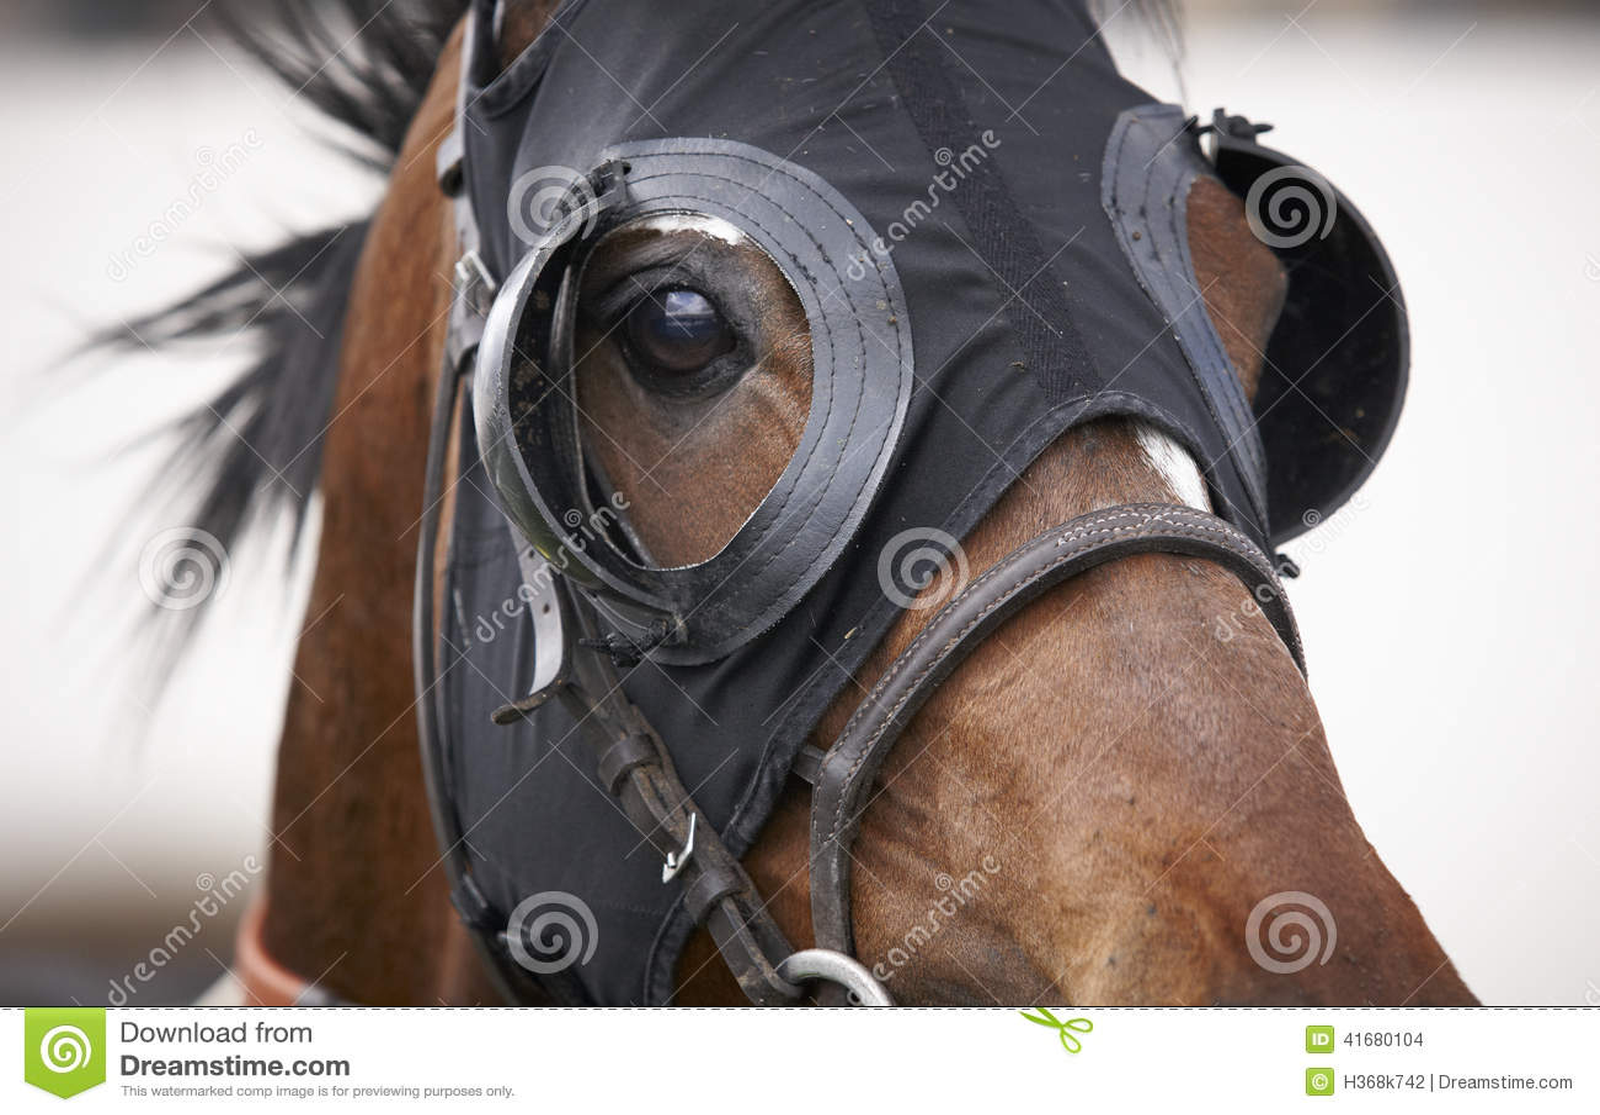 racing blinkers for horses